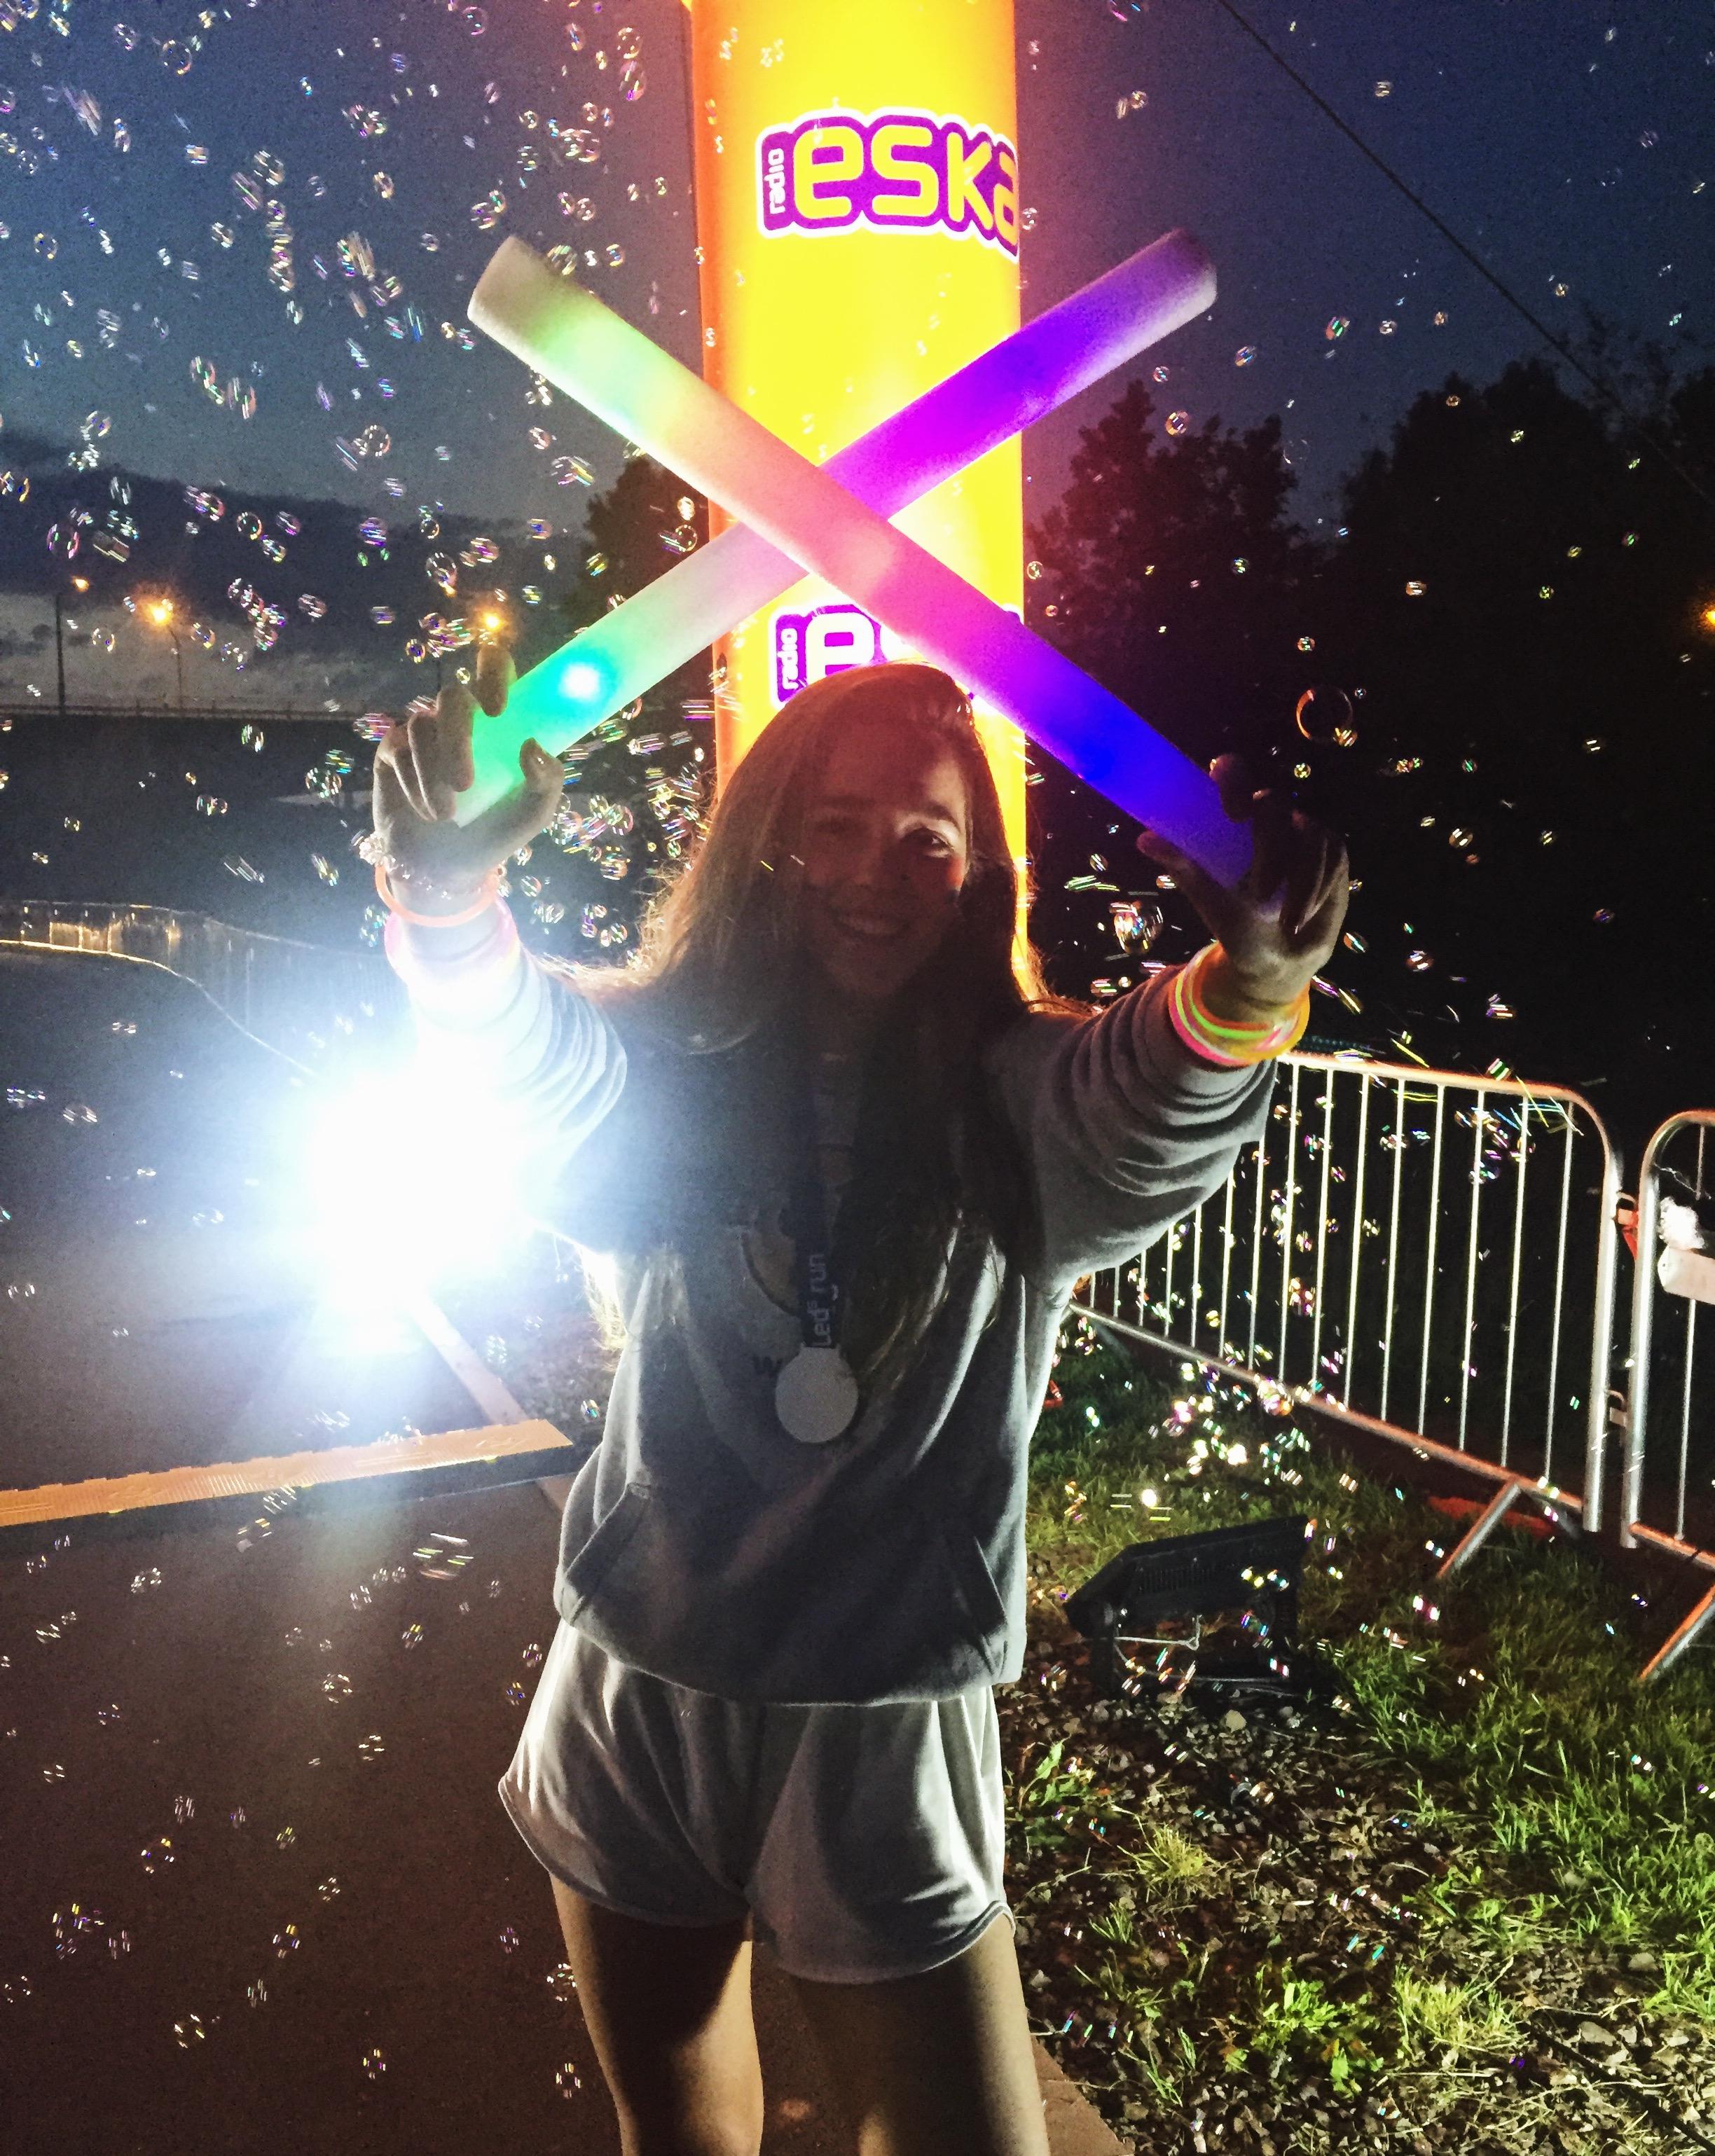 Bieg ESKA LEDs RUN relacja